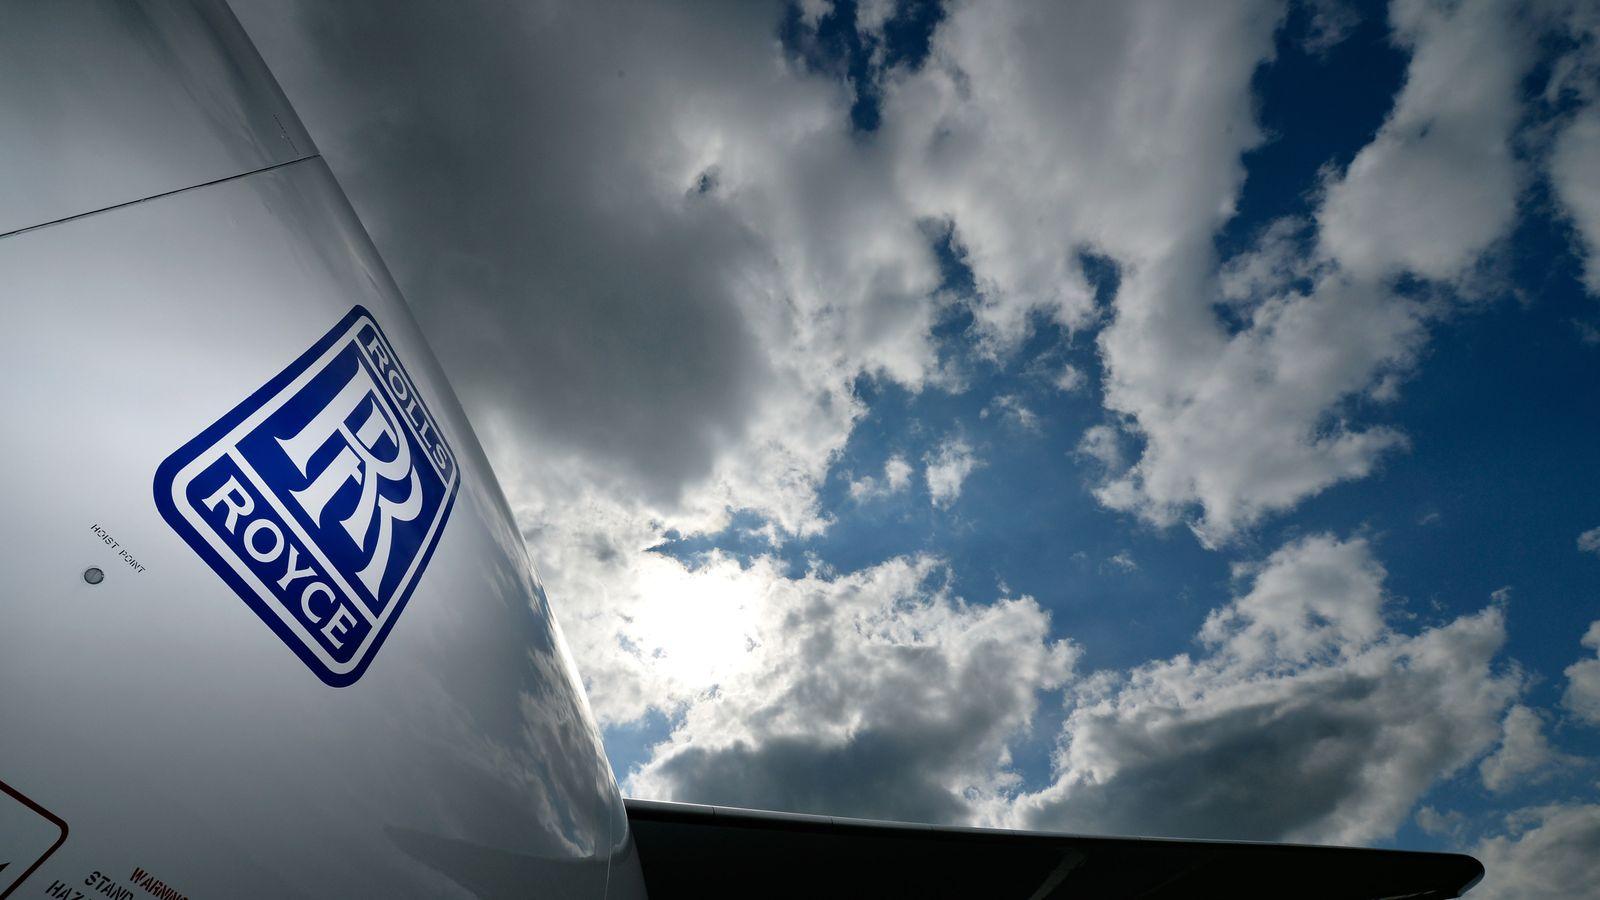 Rolls Royce 'to cut 8,000 jobs' as coronavirus lockdown hits air travel